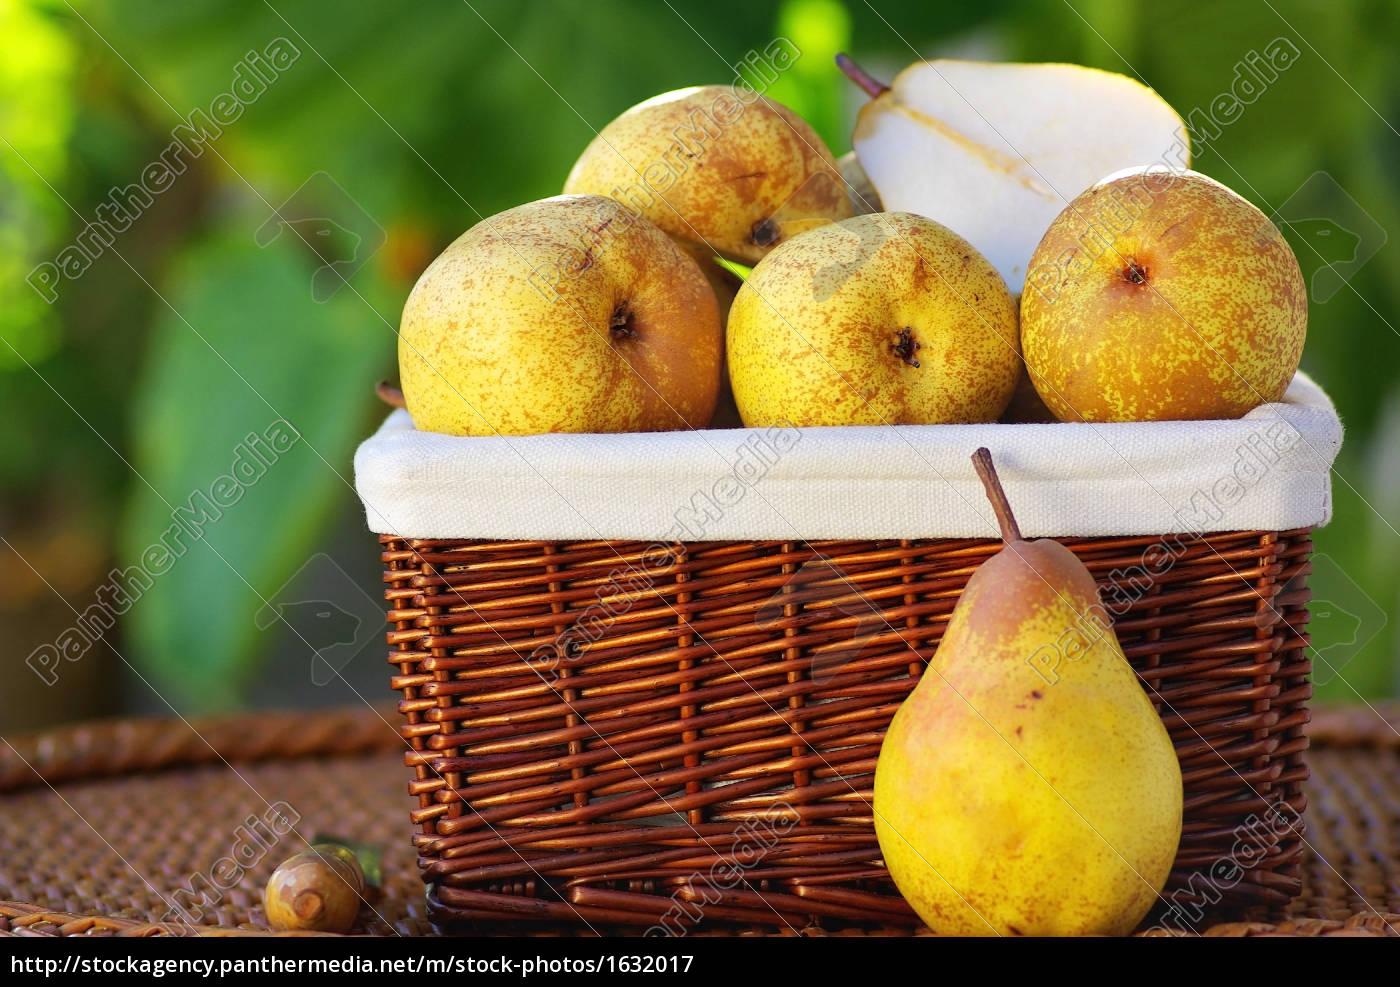 basket, of, fresh, pears. - 1632017